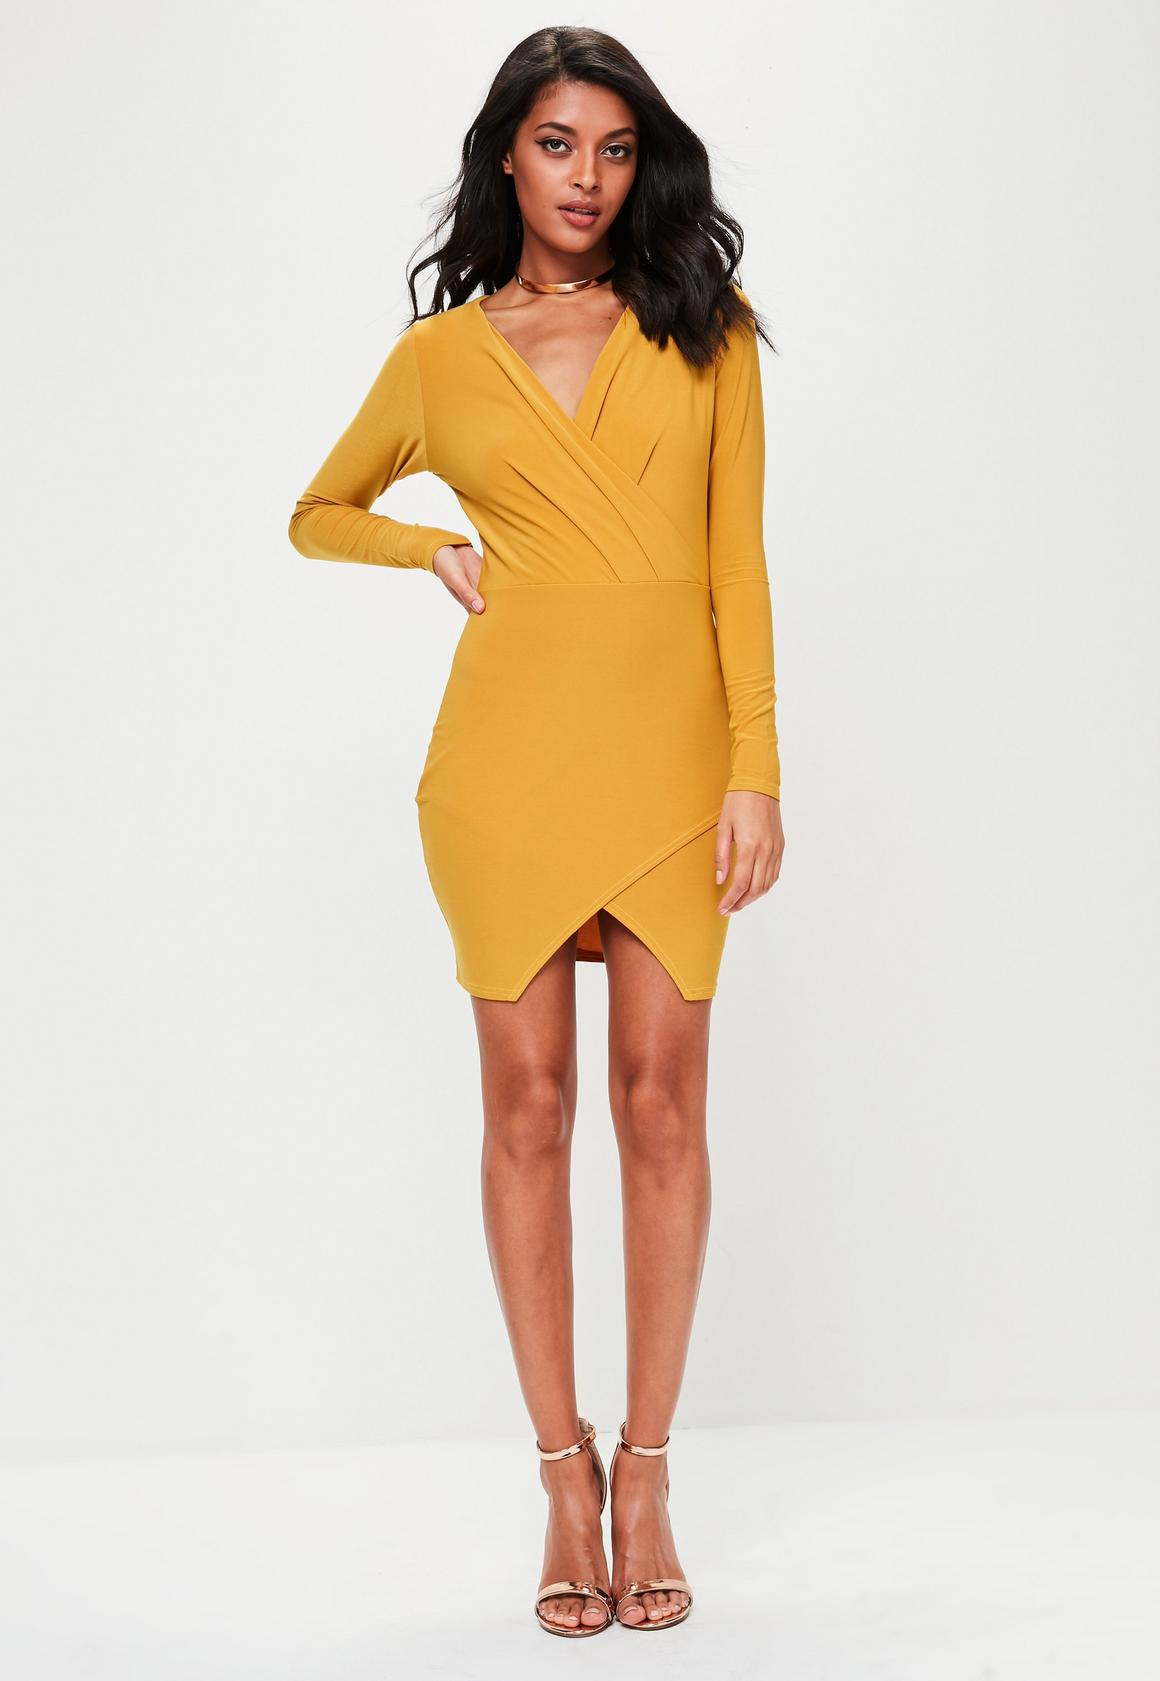 Yellow long sleeve bodycon dress.